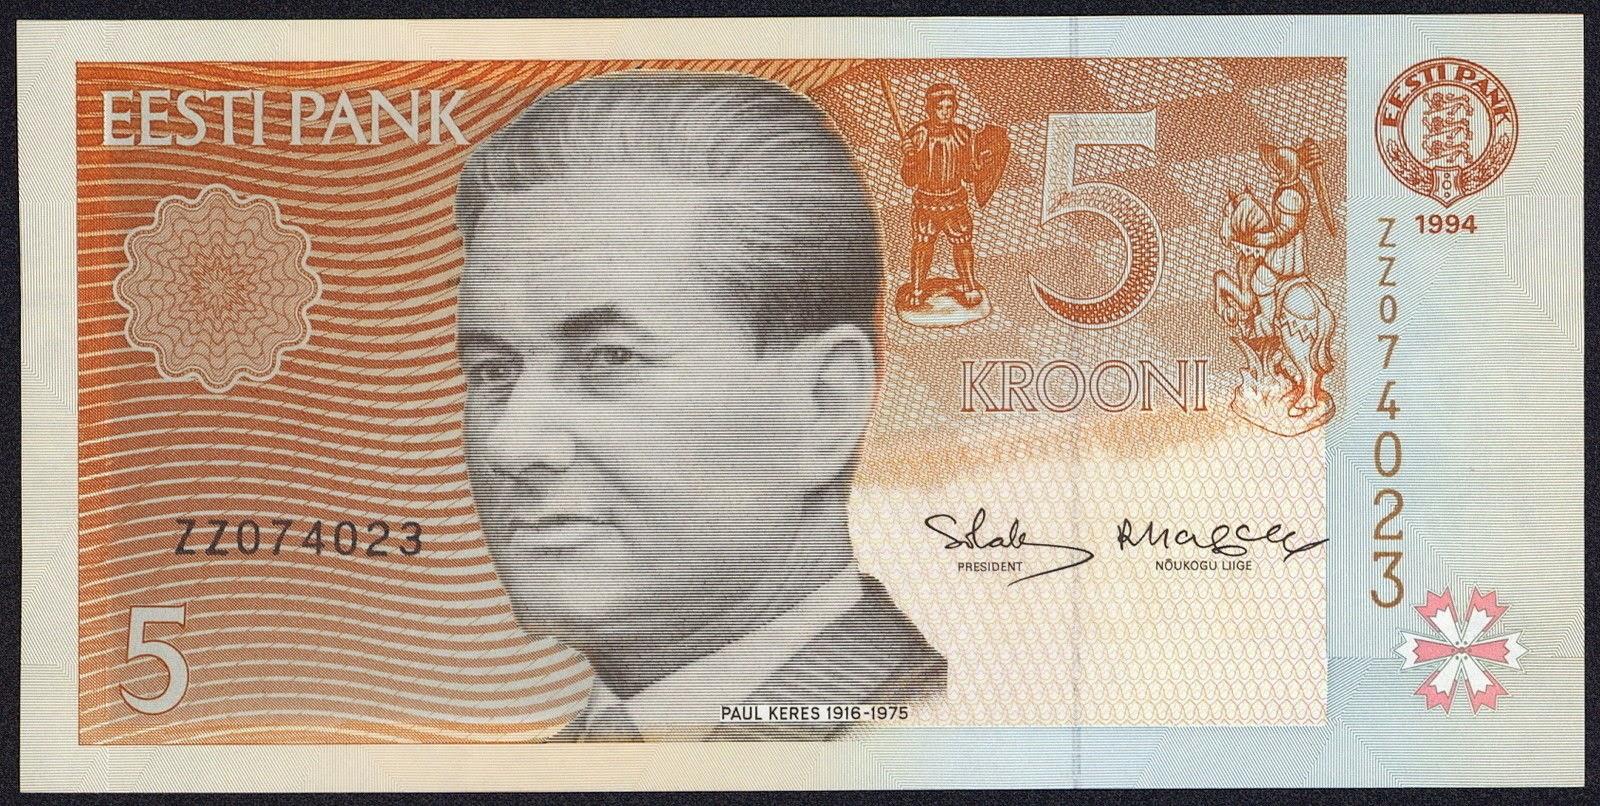 Estonia currency money 5 krooni banknote, Paul Keres